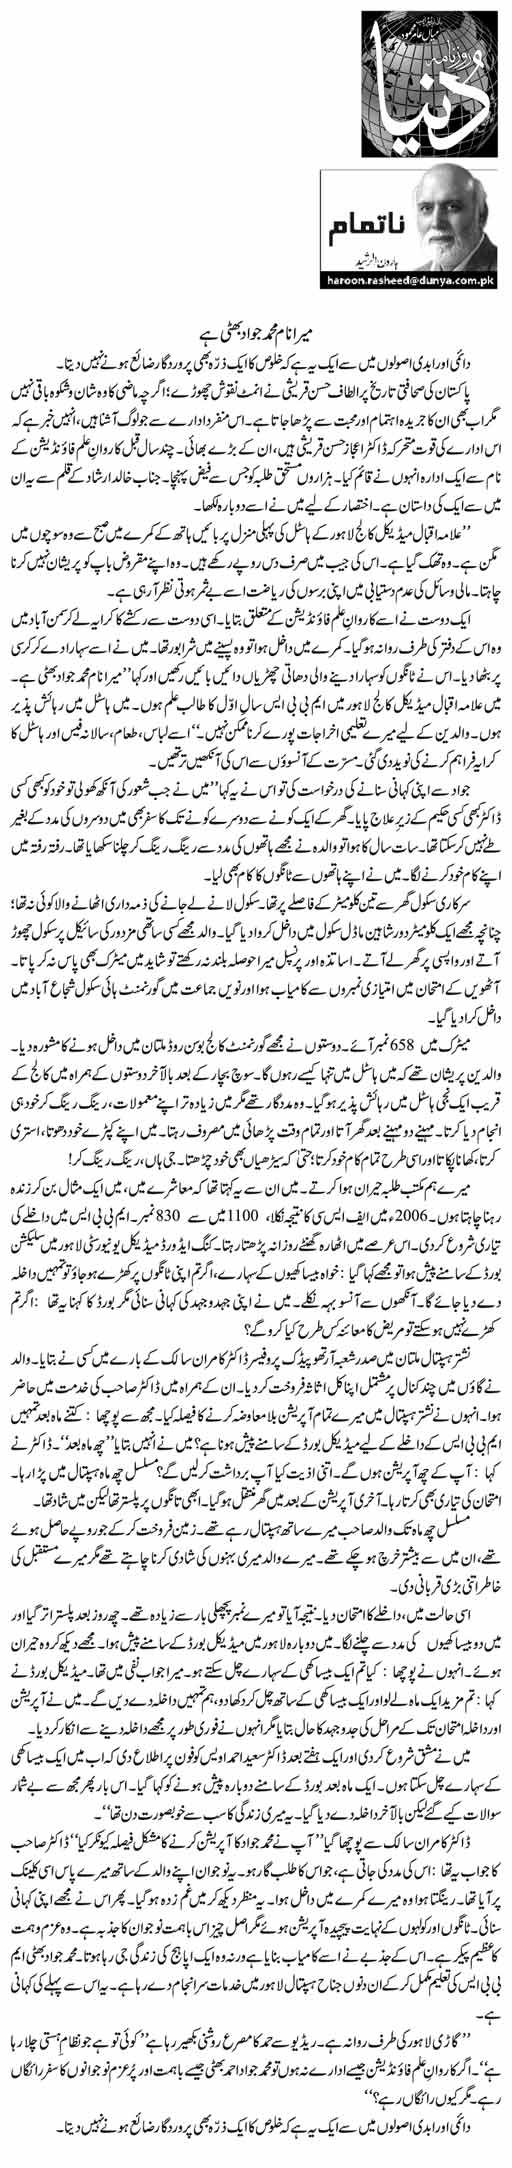 Mera Naam Mohammad Jawad Bhatti Hai | Haroon Ur Rasheed | Daily Urdu Columns